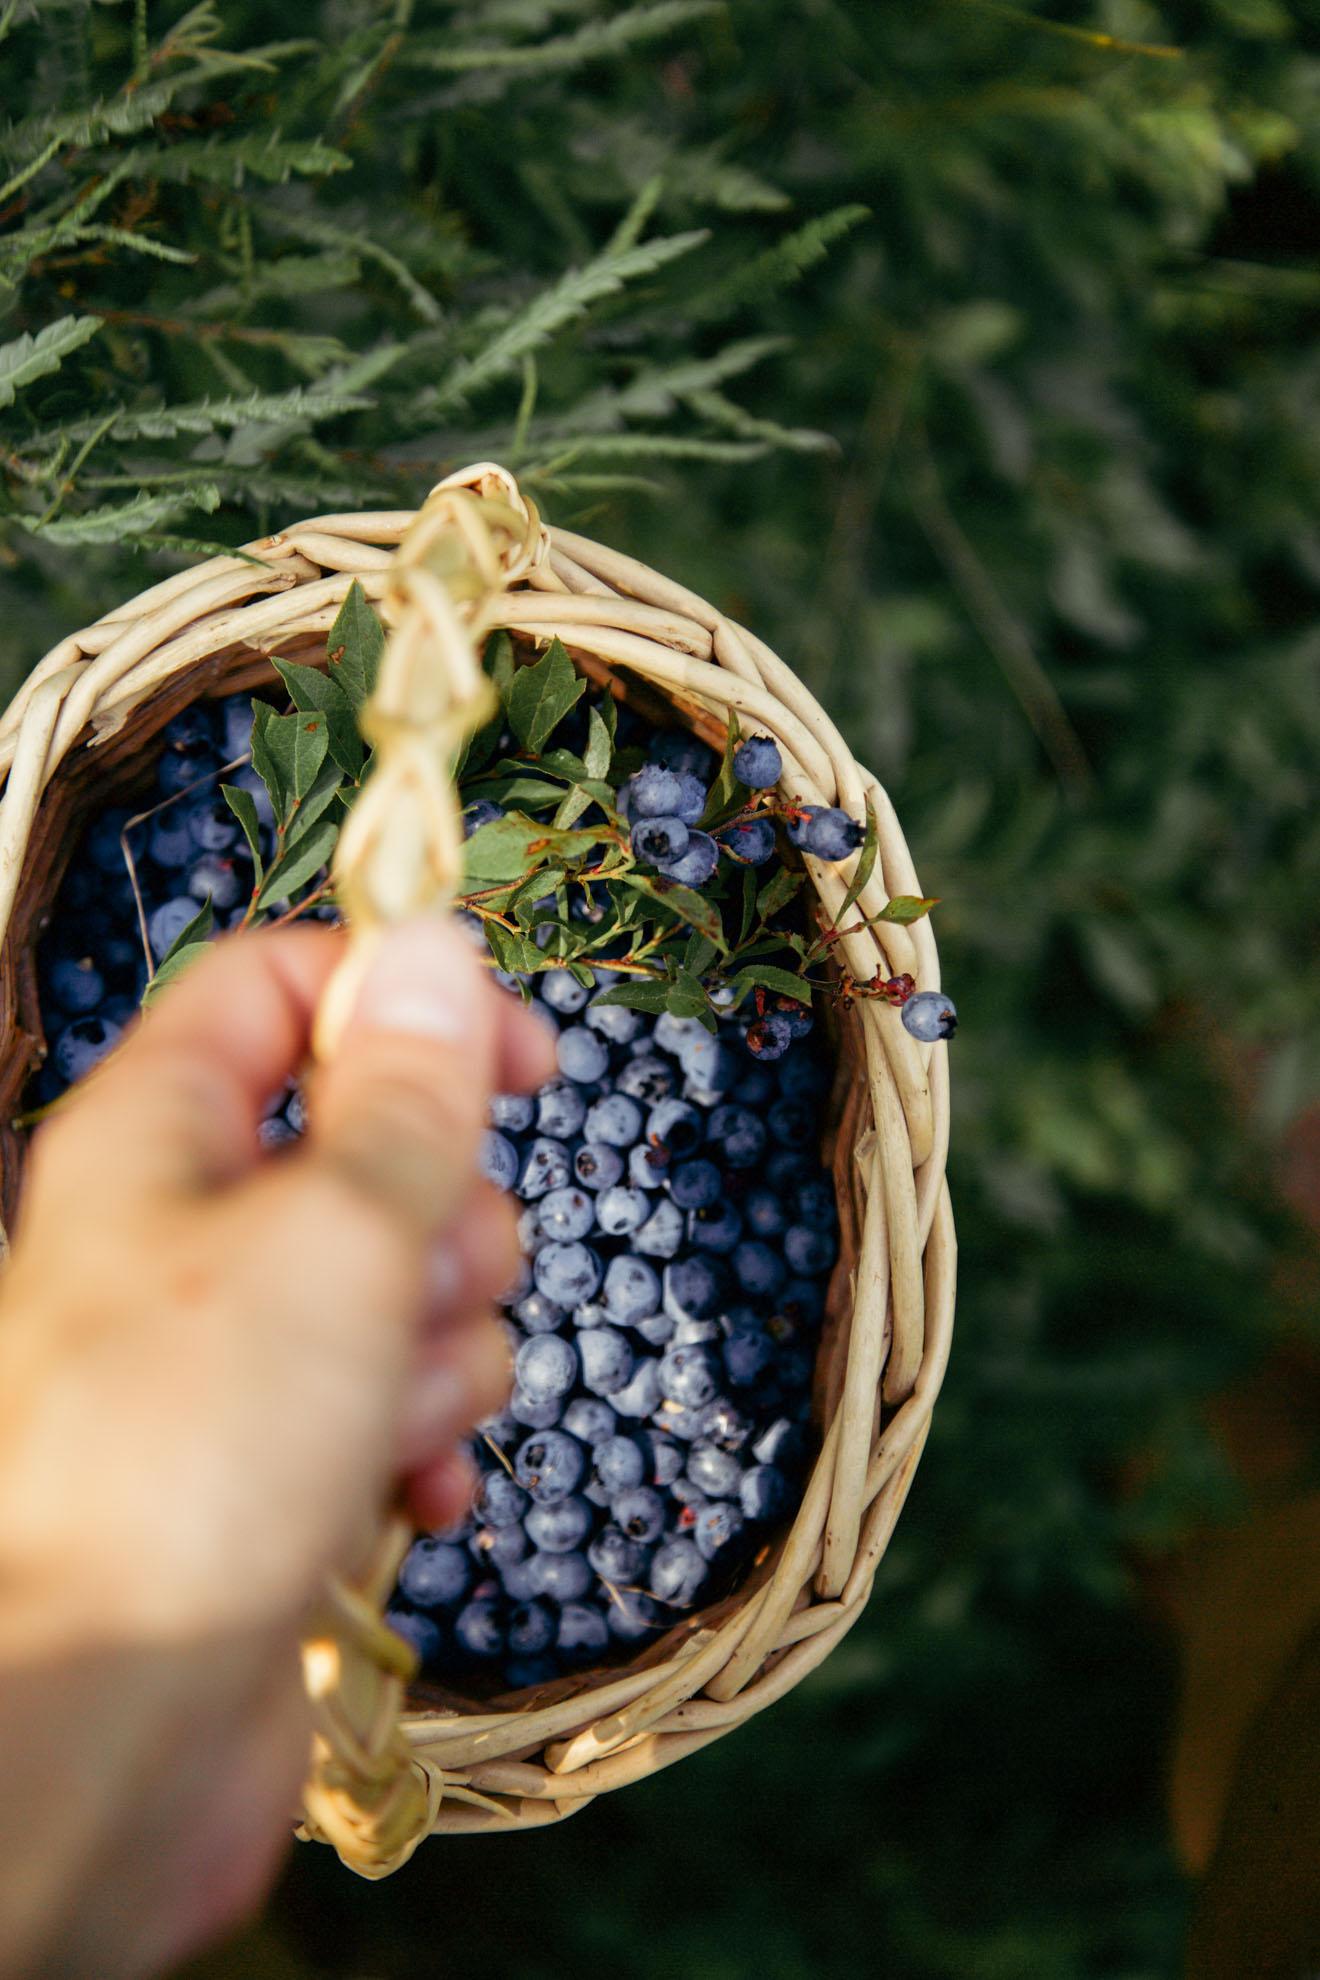 Blueberry Picking | Miss Northerner